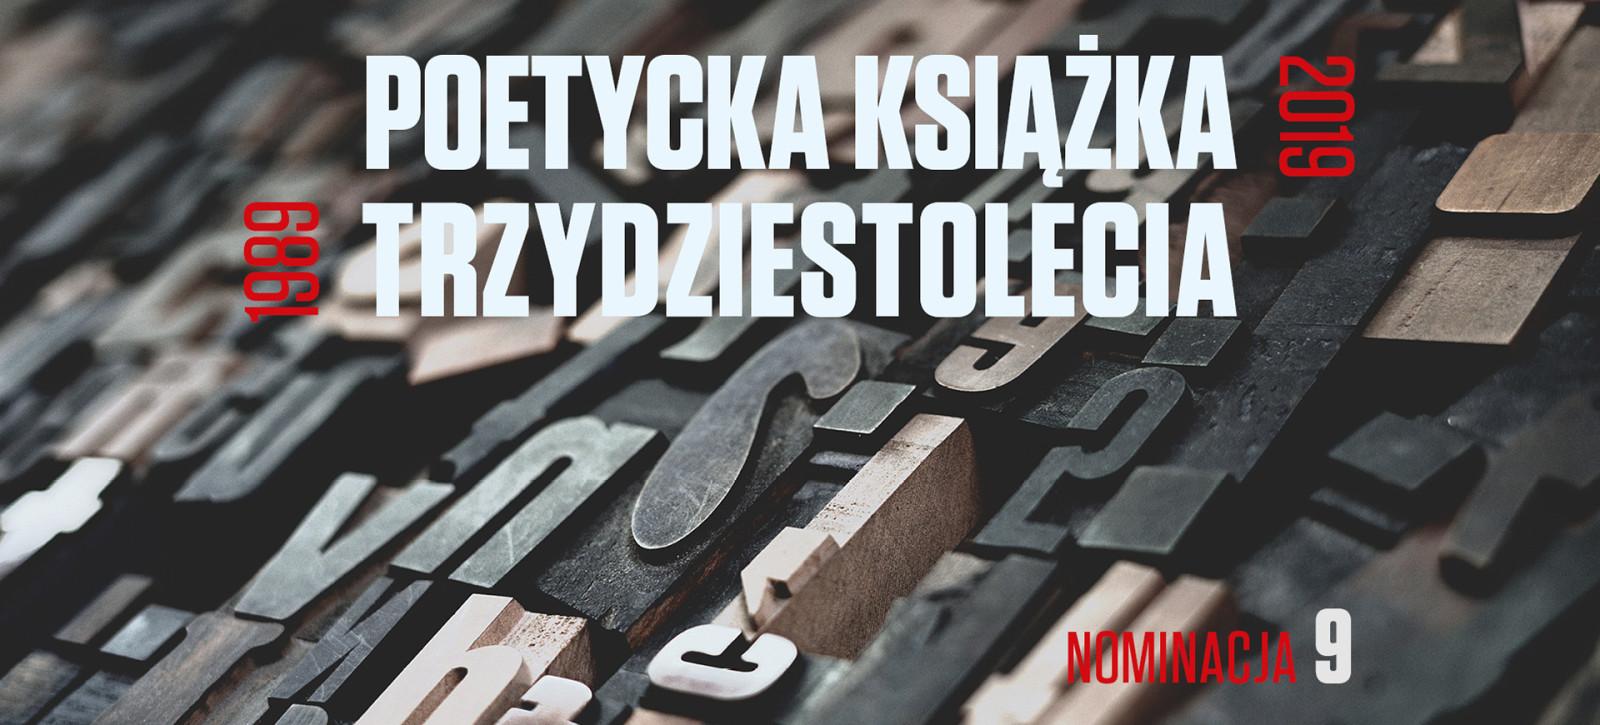 16_DEBATY__Karolina FELBERG-SENDECKA__Poetycka książka trzydziestolecia